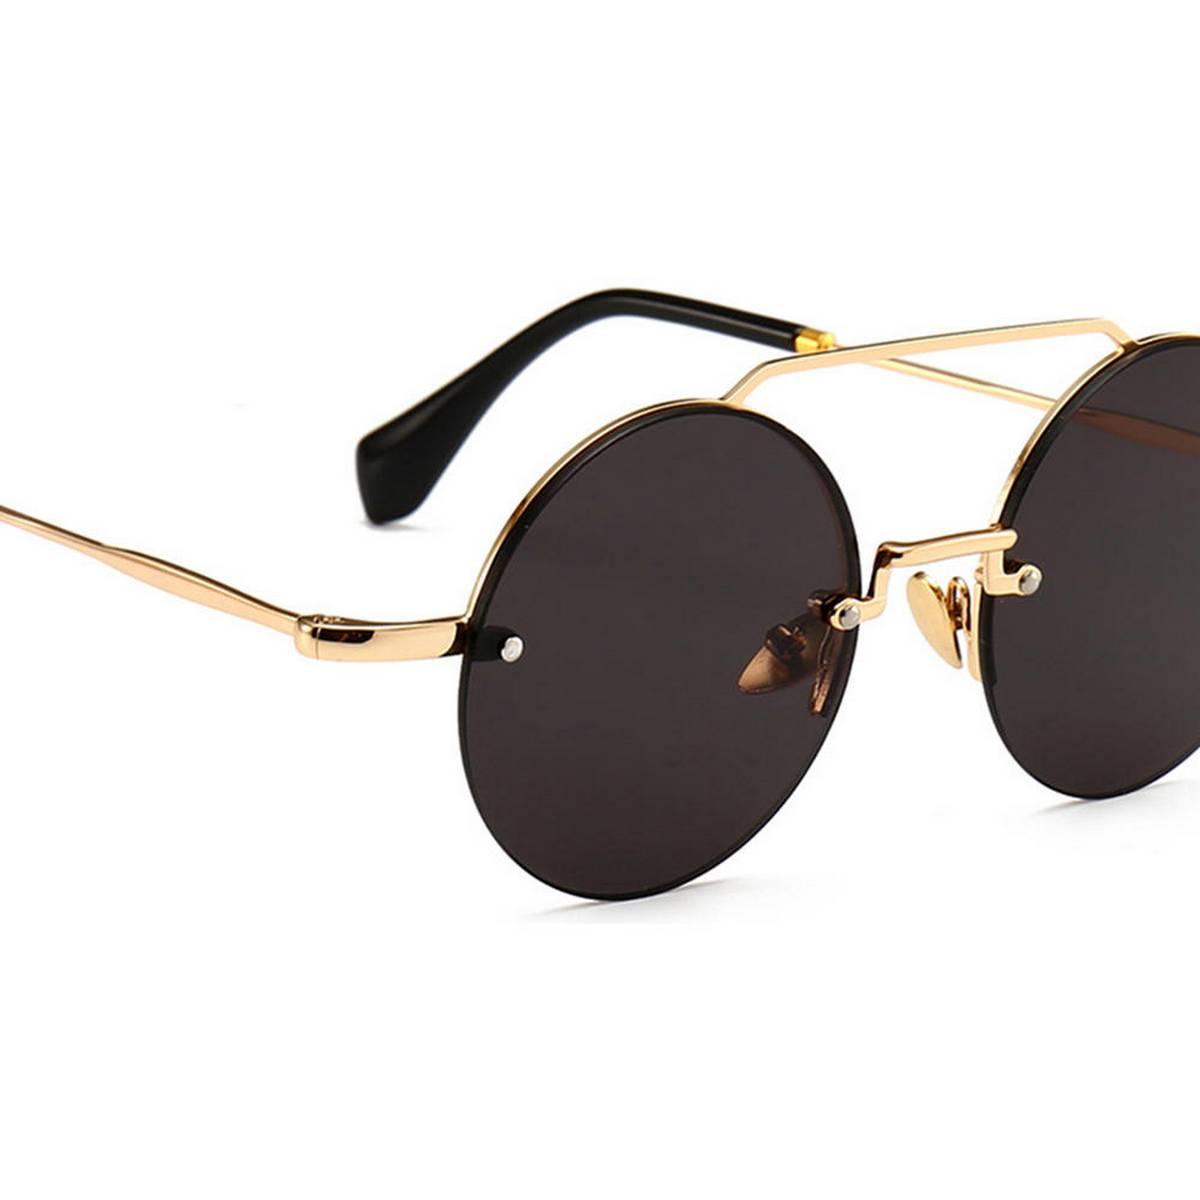 Retro Square Sunglasses Men Tony Stark Sun Glasses